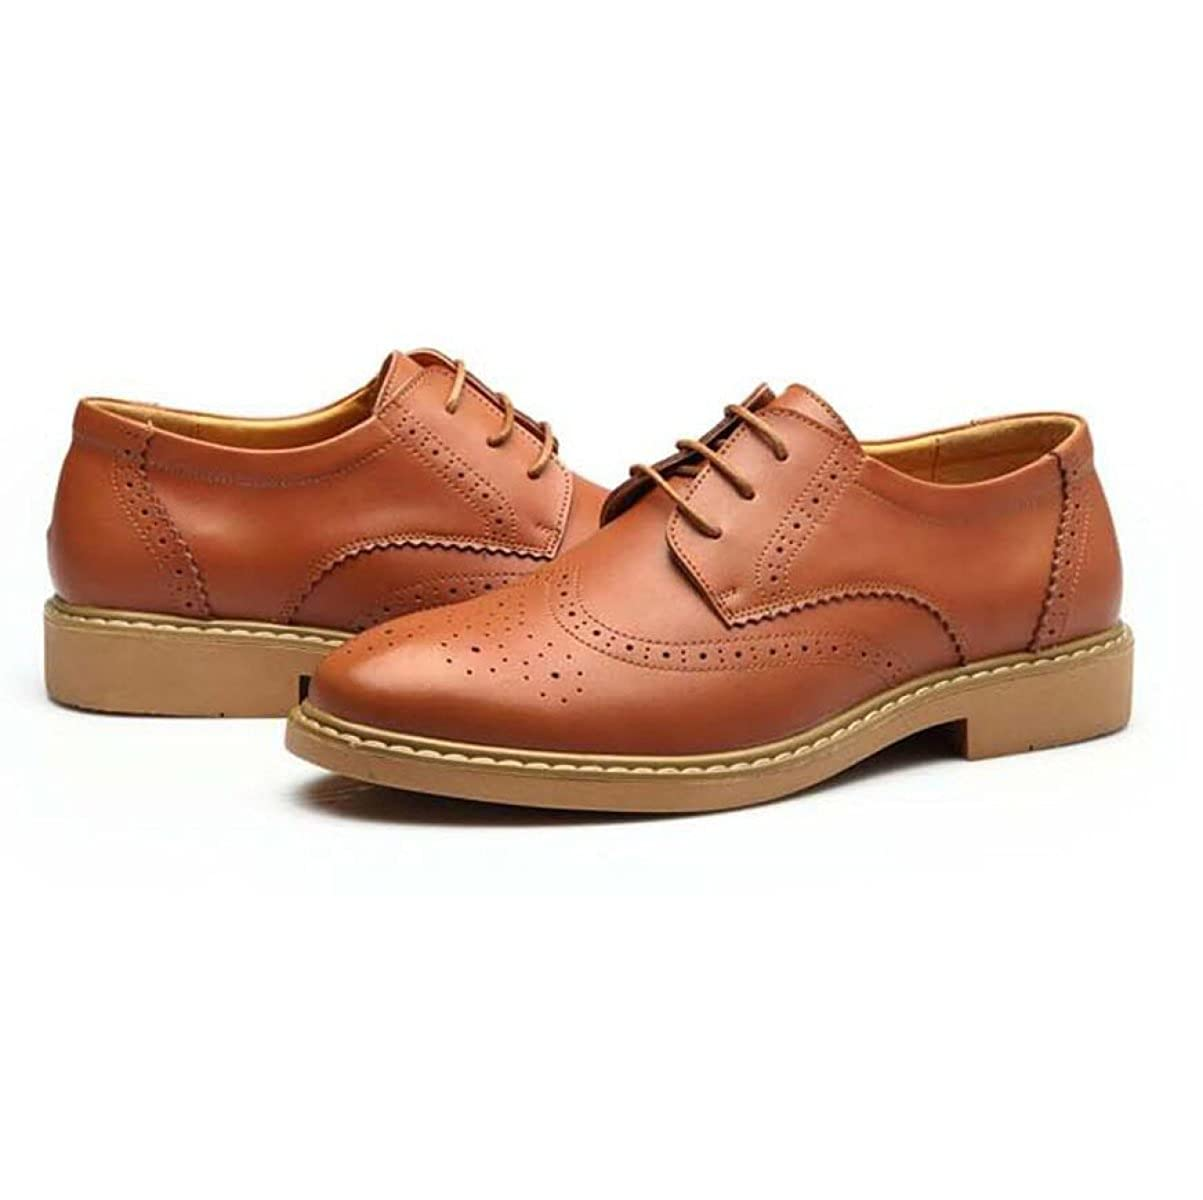 Schuhe Geschnitzt Herrenschuhe Lederspitze Atmungsaktiv Yellow Business Freizeitschuhe Retro Schuhe Yellow Atmungsaktiv 3048b5